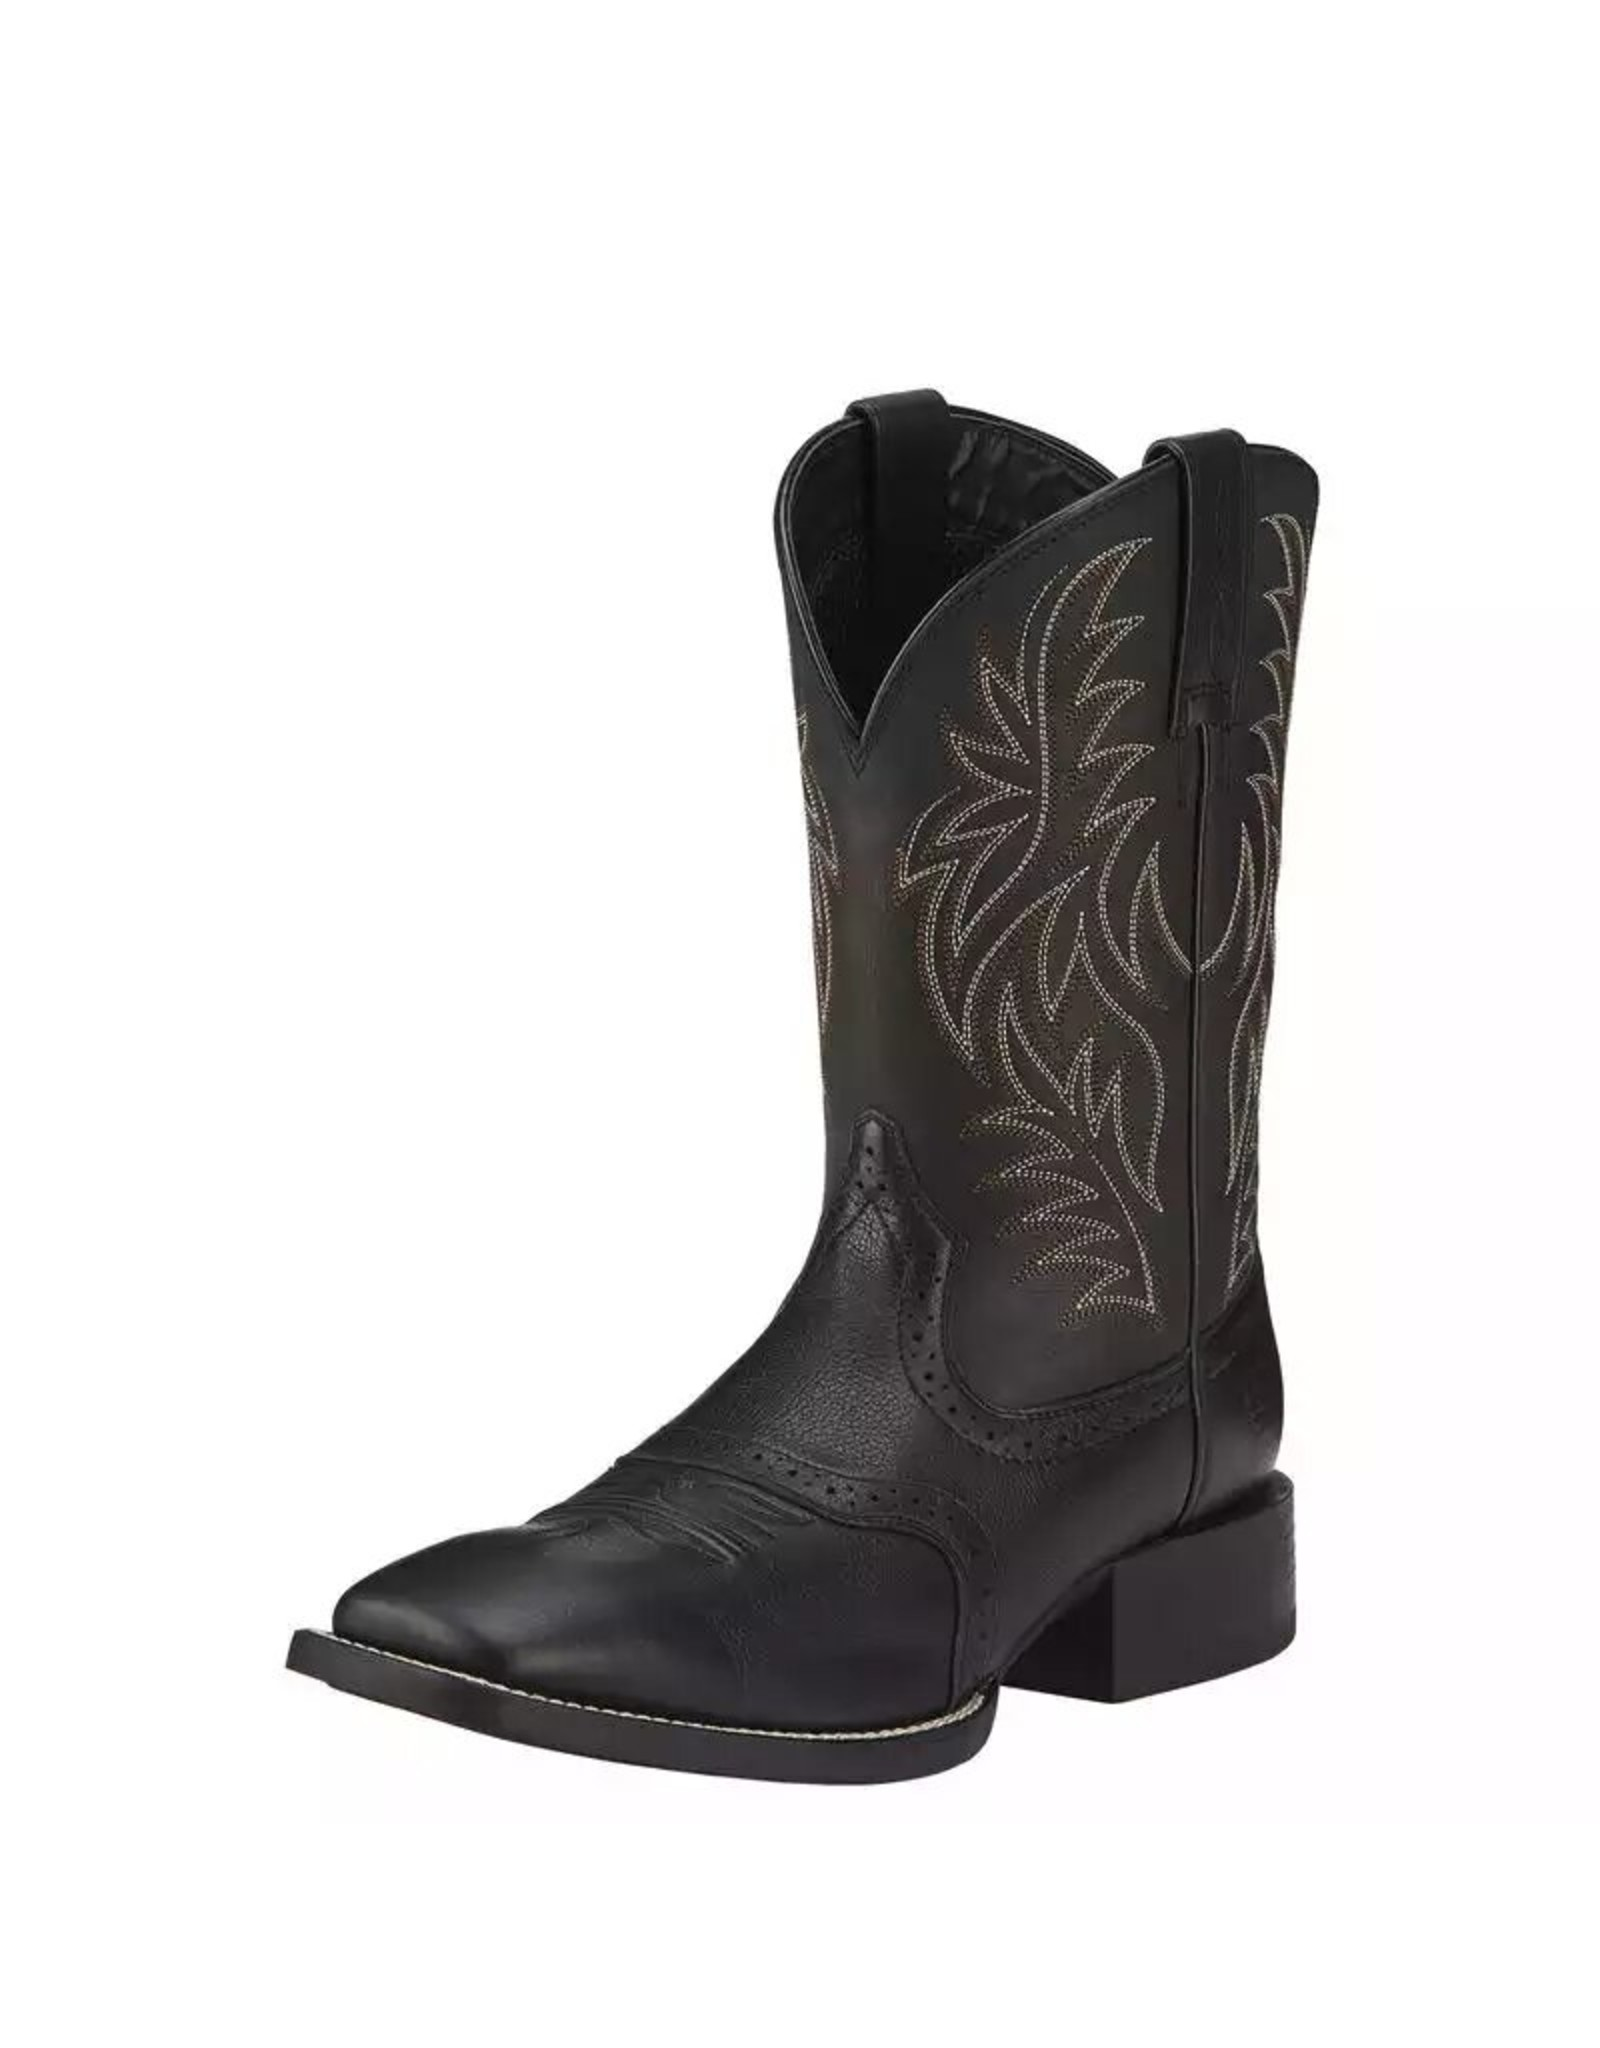 Boots-Men ARIAT Sport Western Wide Sq